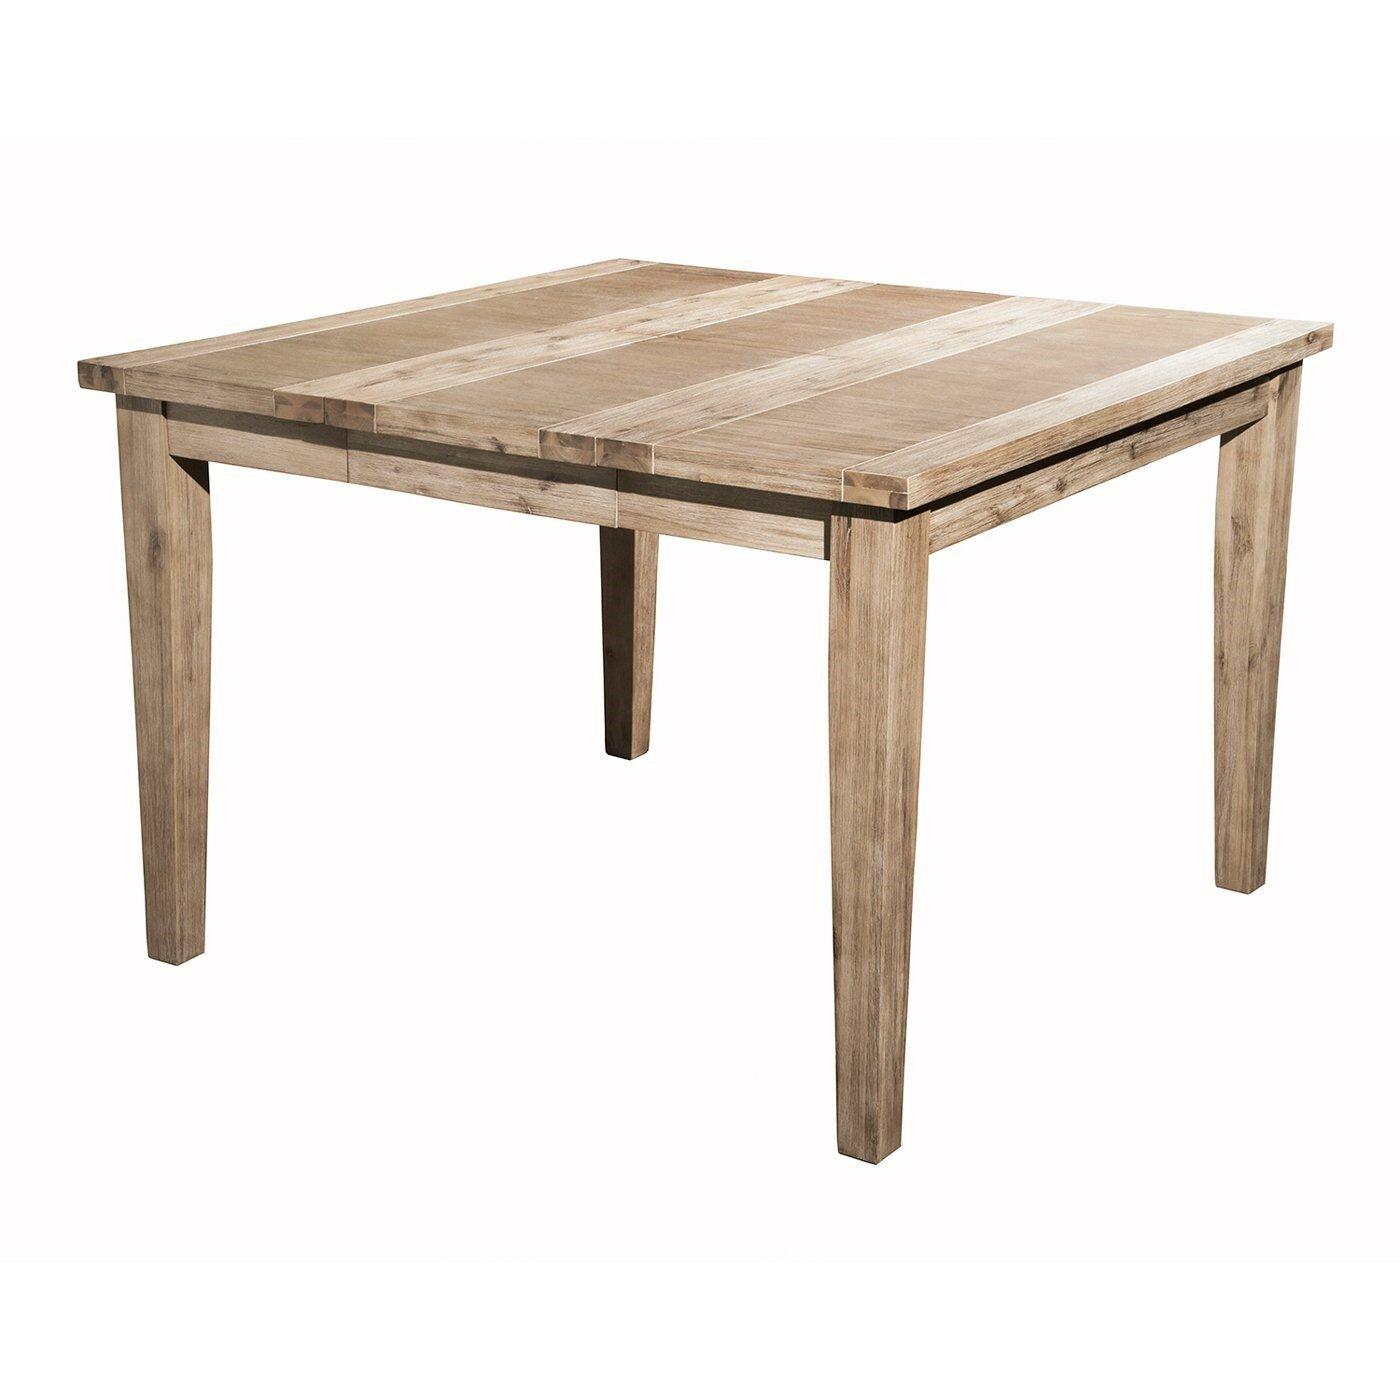 Standard Kitchen Table Sizes